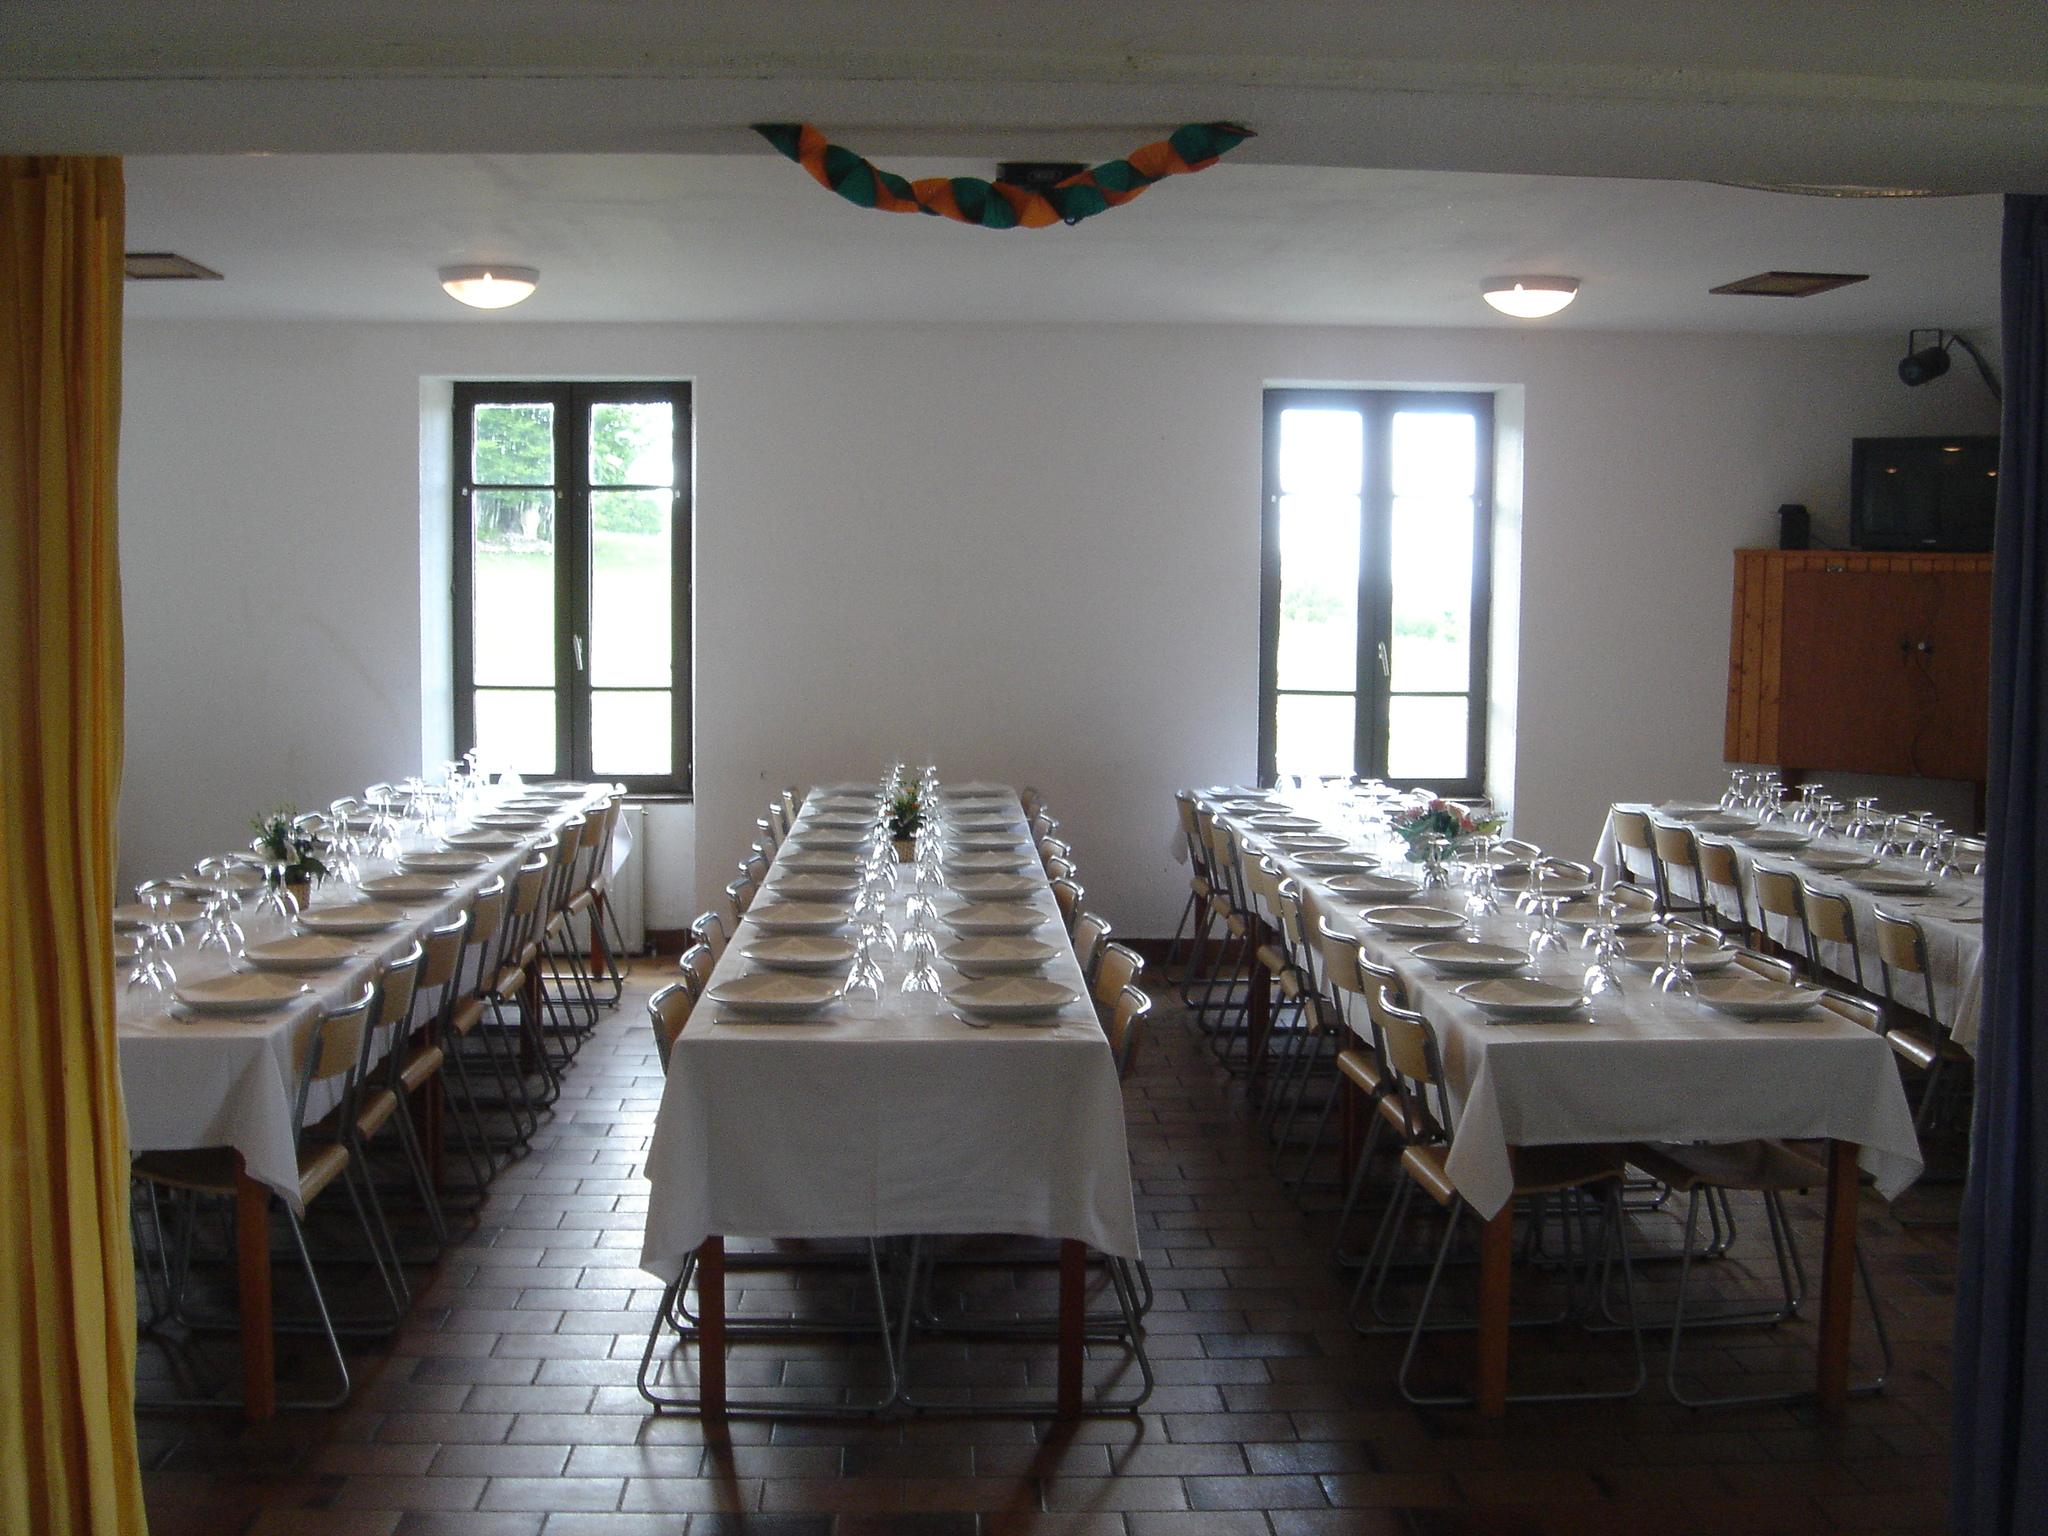 Salle à manger du Chalet Guèroz